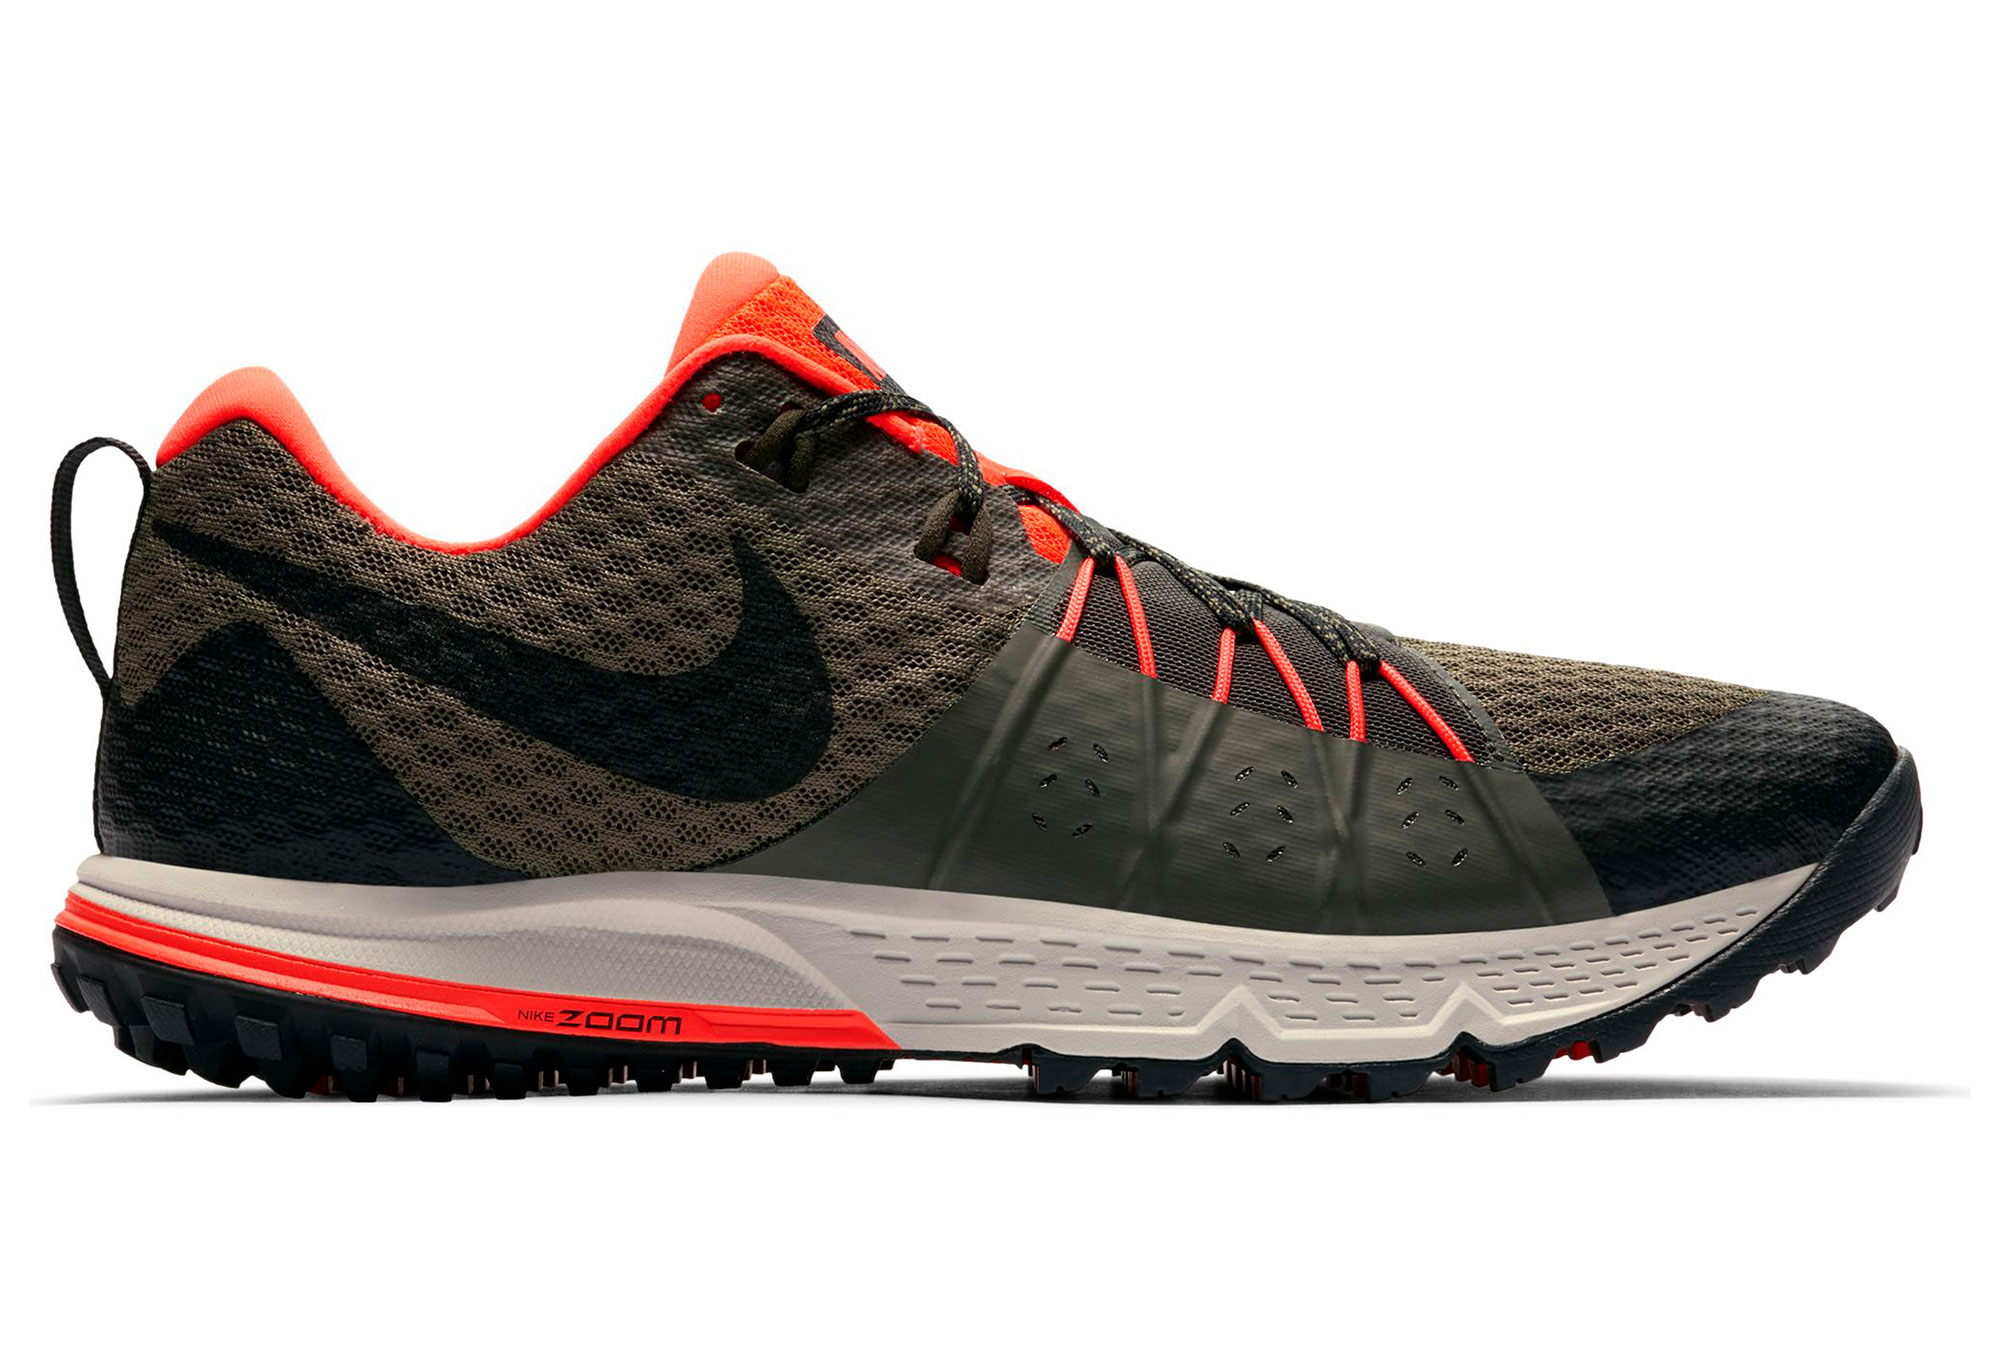 69648600099b2 Nike Shoes Air Zoom Wildhorse 4 Khaki Orange Men